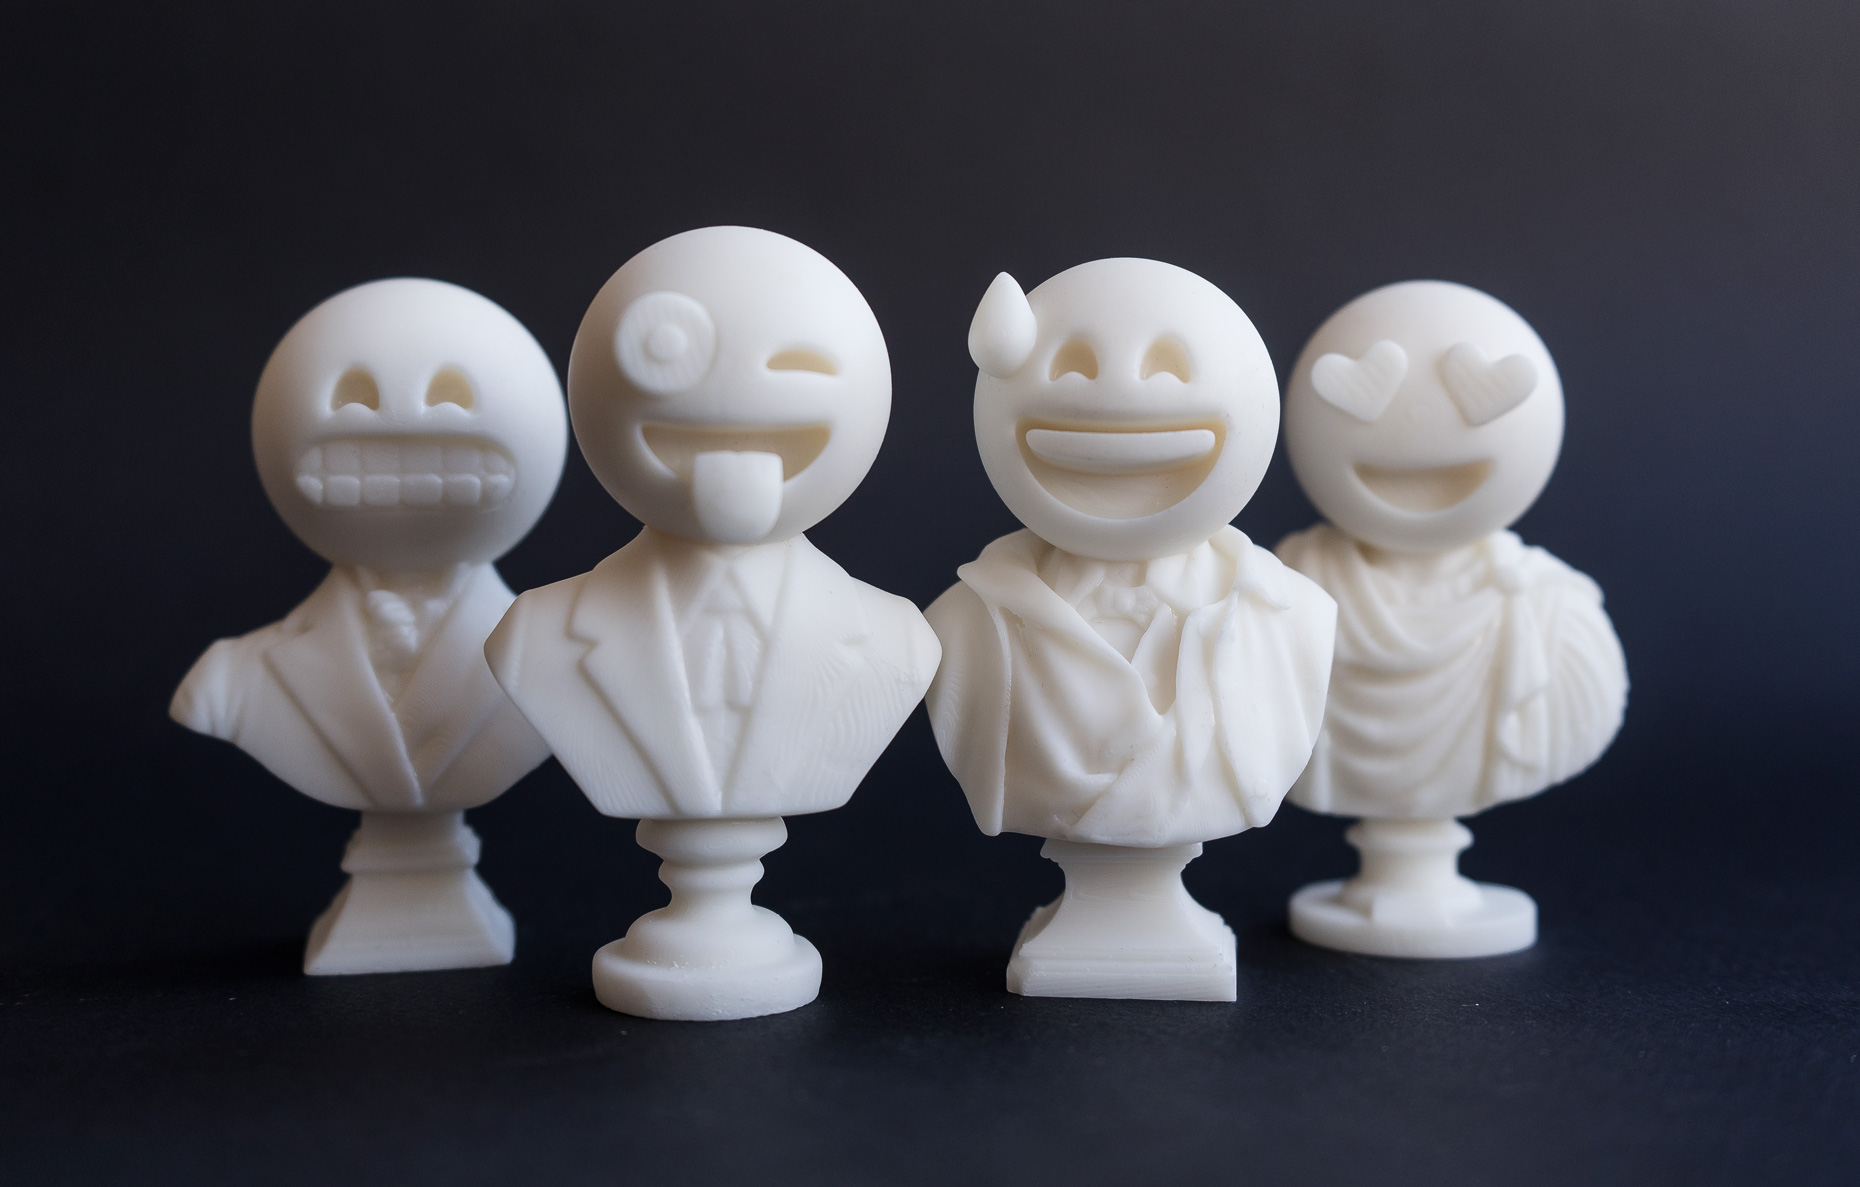 Sculptmojis_3DPrinted_BenFearnley.jpg